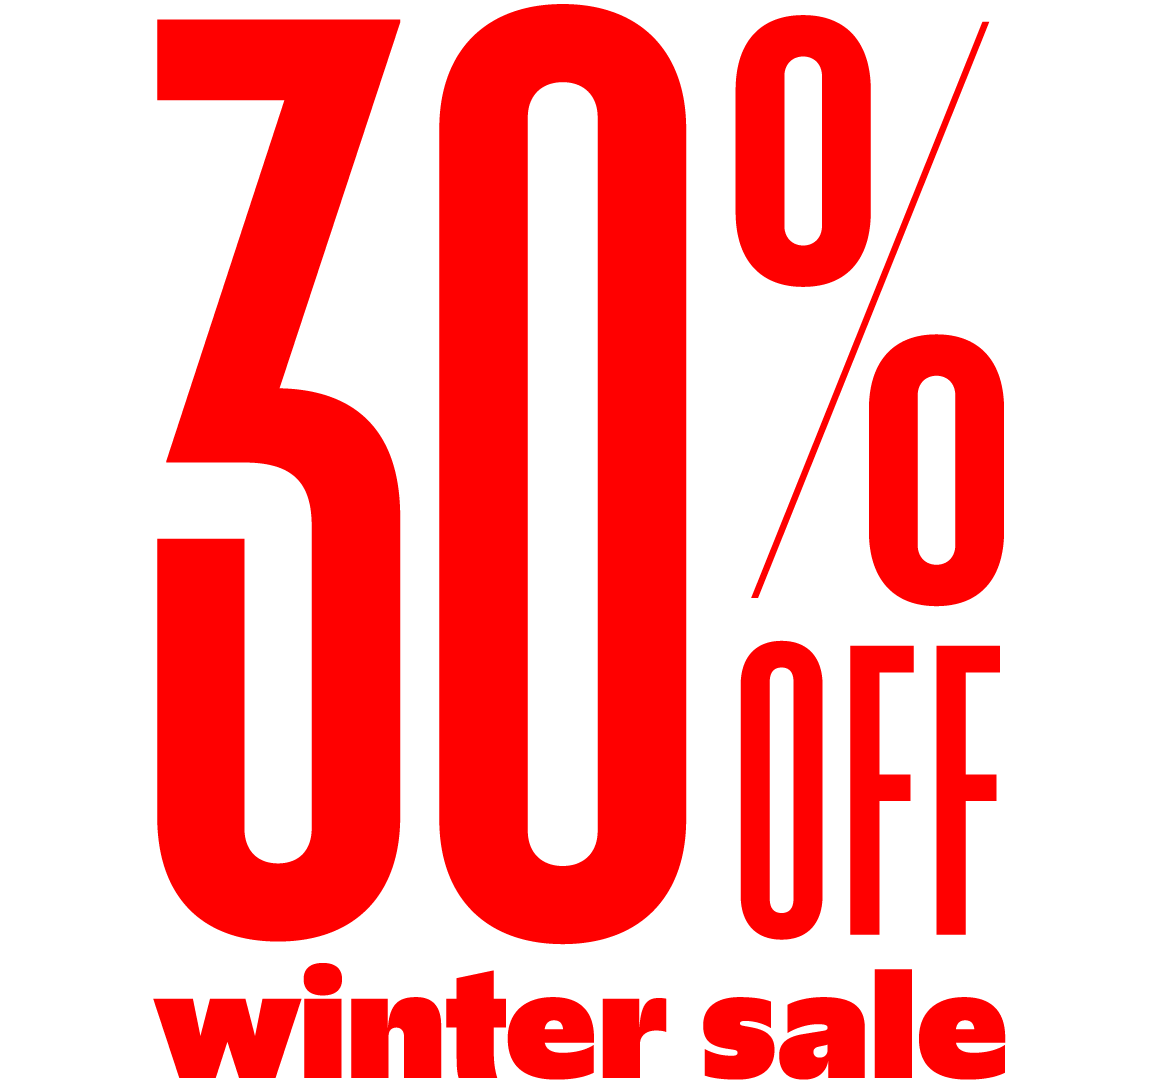 Winter sale: take 30% off